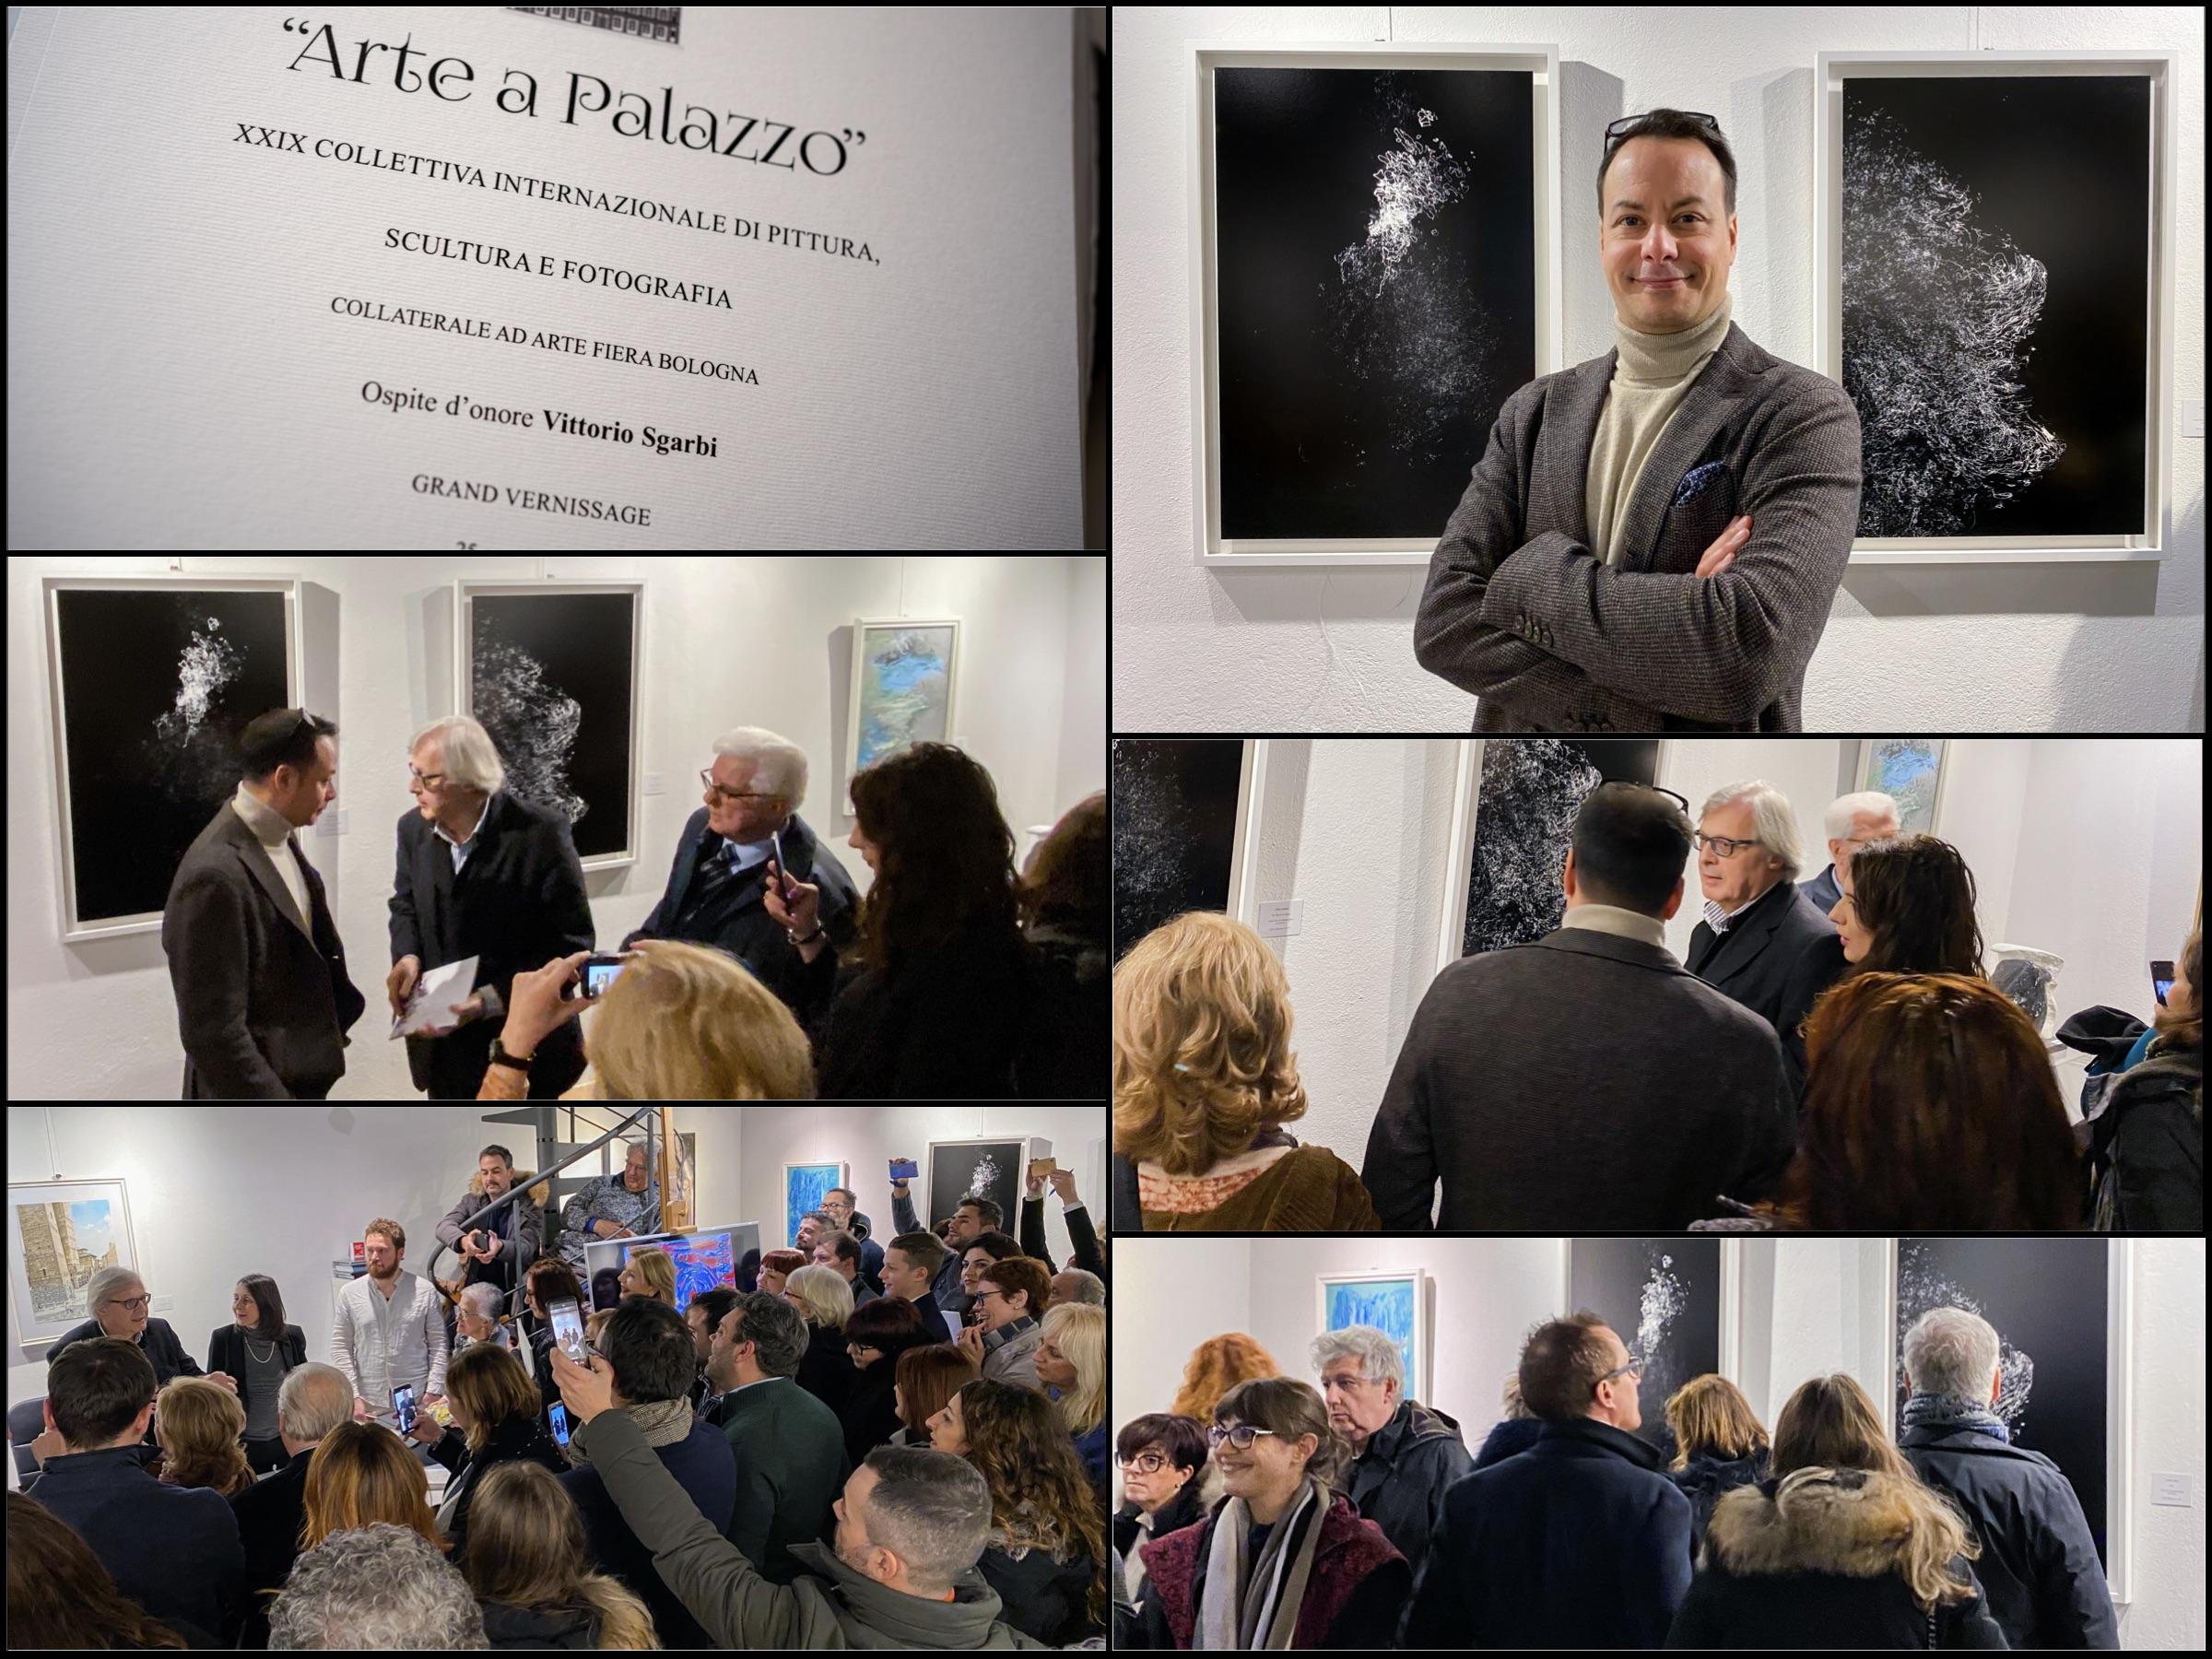 Arte a Palazzo XXIX 1